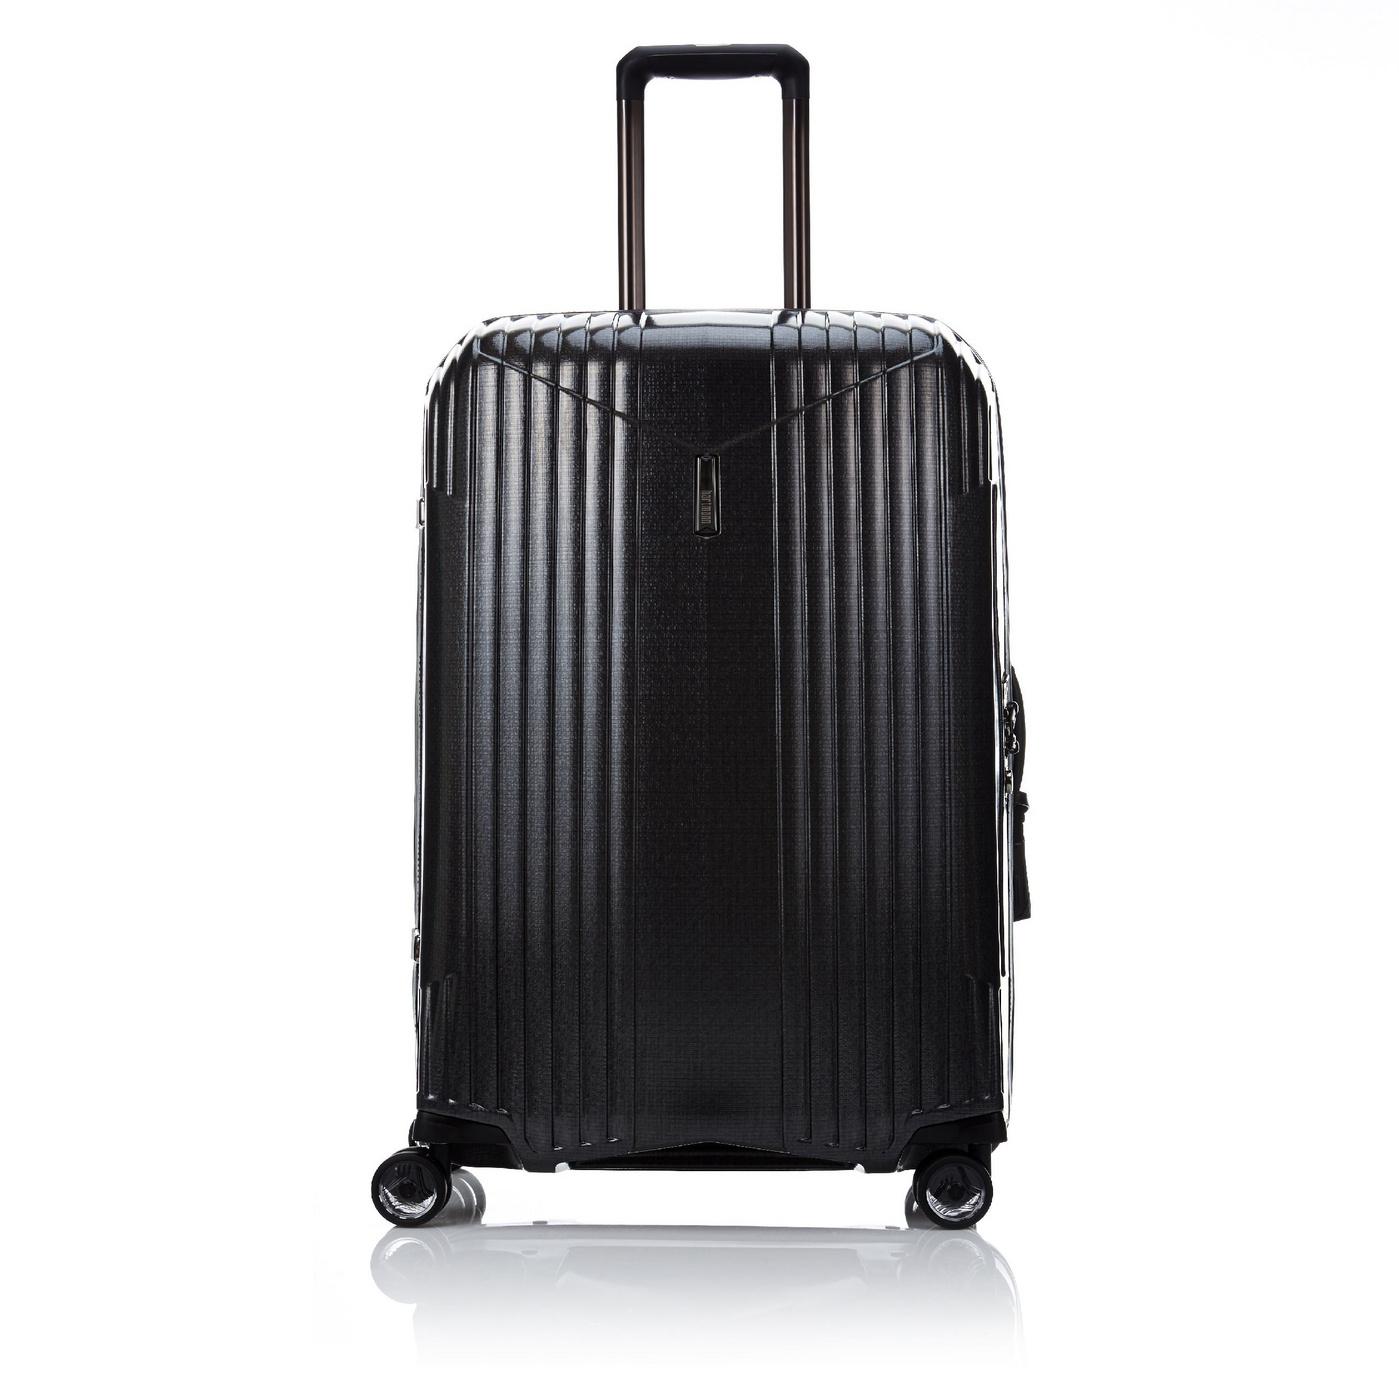 Samsonite 新秀麗Hartmann系列品牌四輪拉桿箱時尚旅行箱定制黑色20寸G9709201